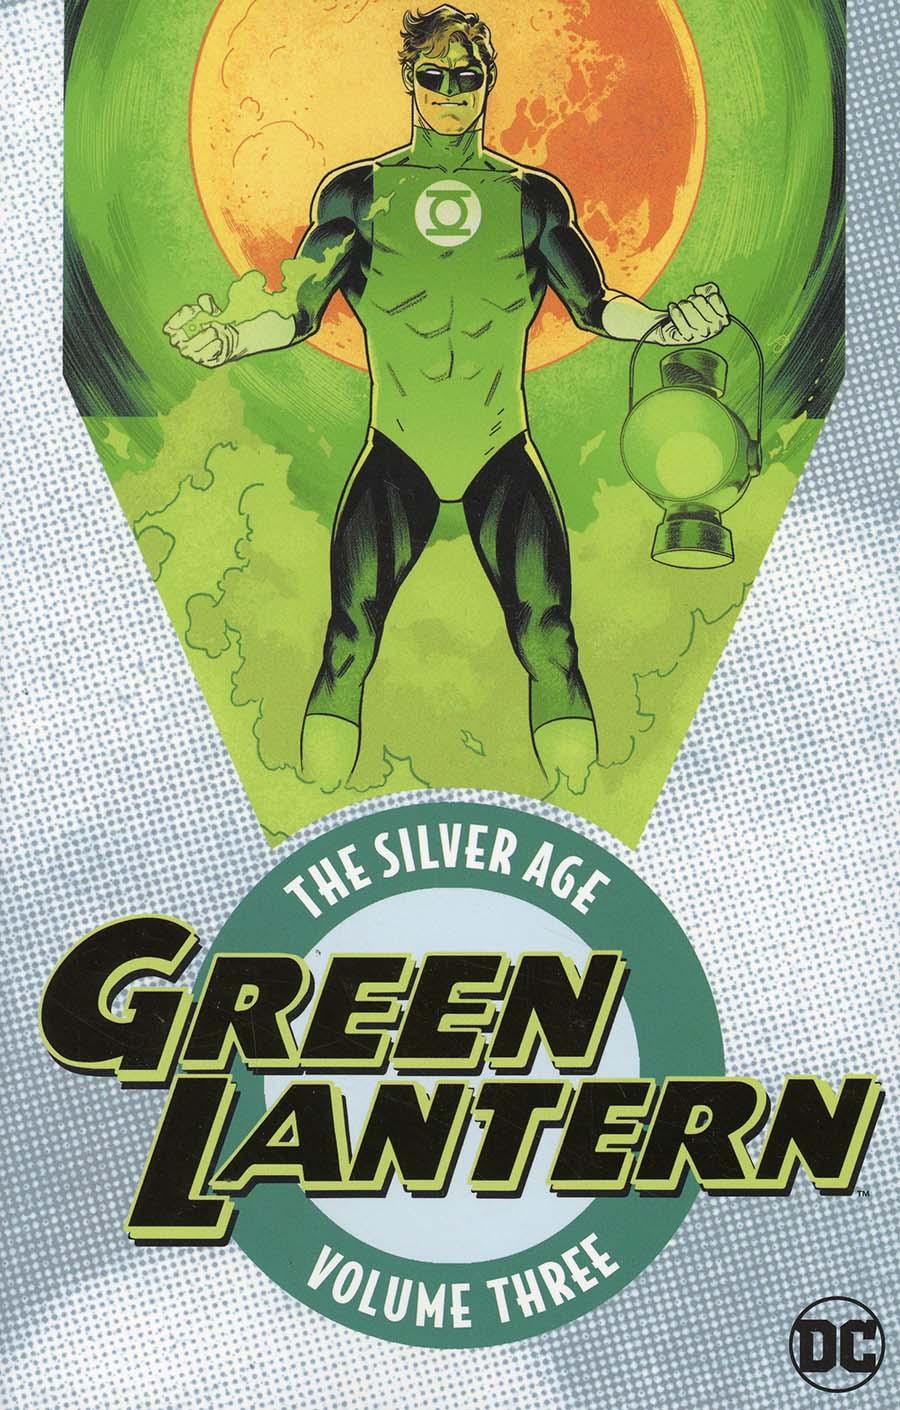 Green Lantern The Silver Age Vol 3 TP